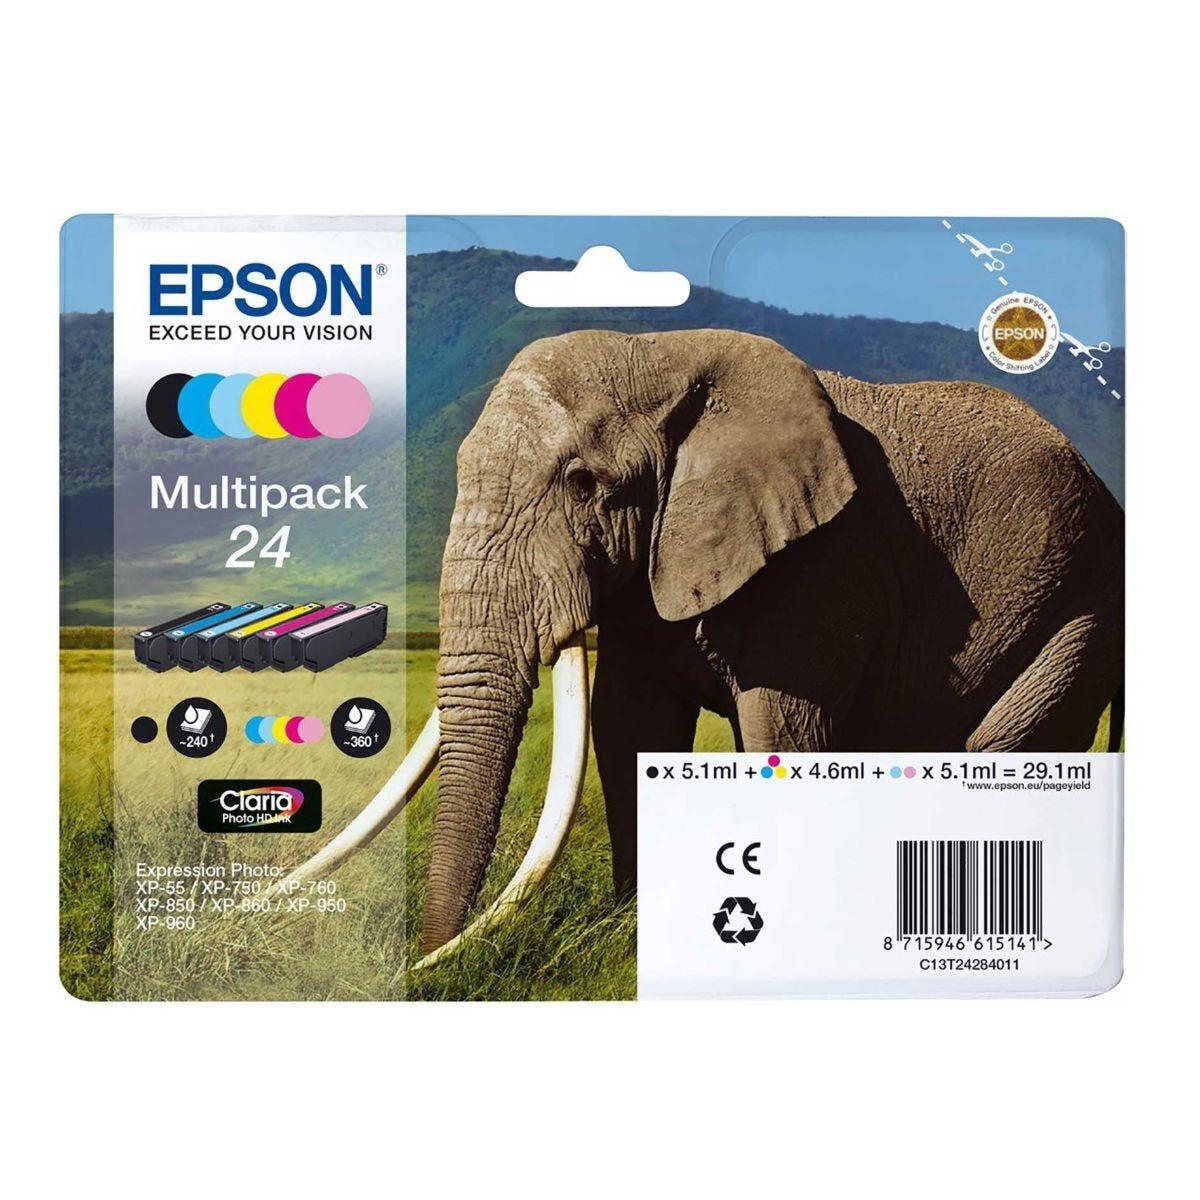 Epson 24 Elephant Multipack Claria Photo HD Ink